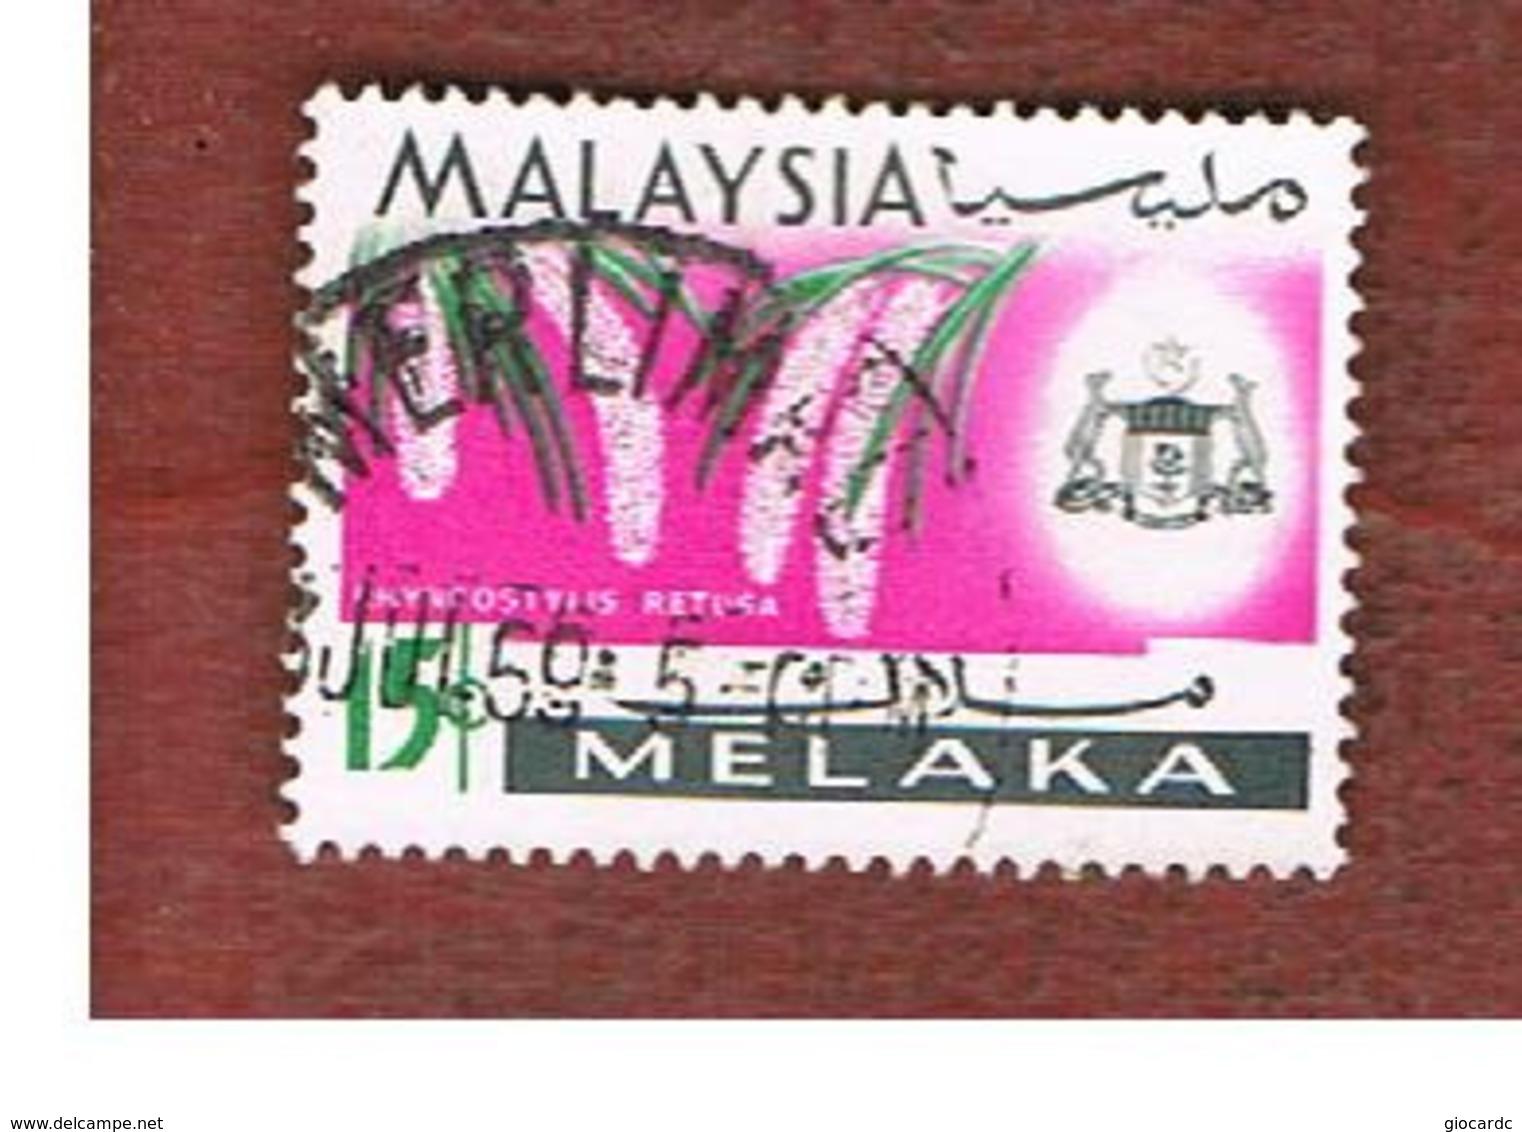 MALESIA: MALACCA (MALAYSIA) -  SG 66 -  1965   RHYNCHOSTYLIS RETUSA        - USED ° - Malesia (1964-...)